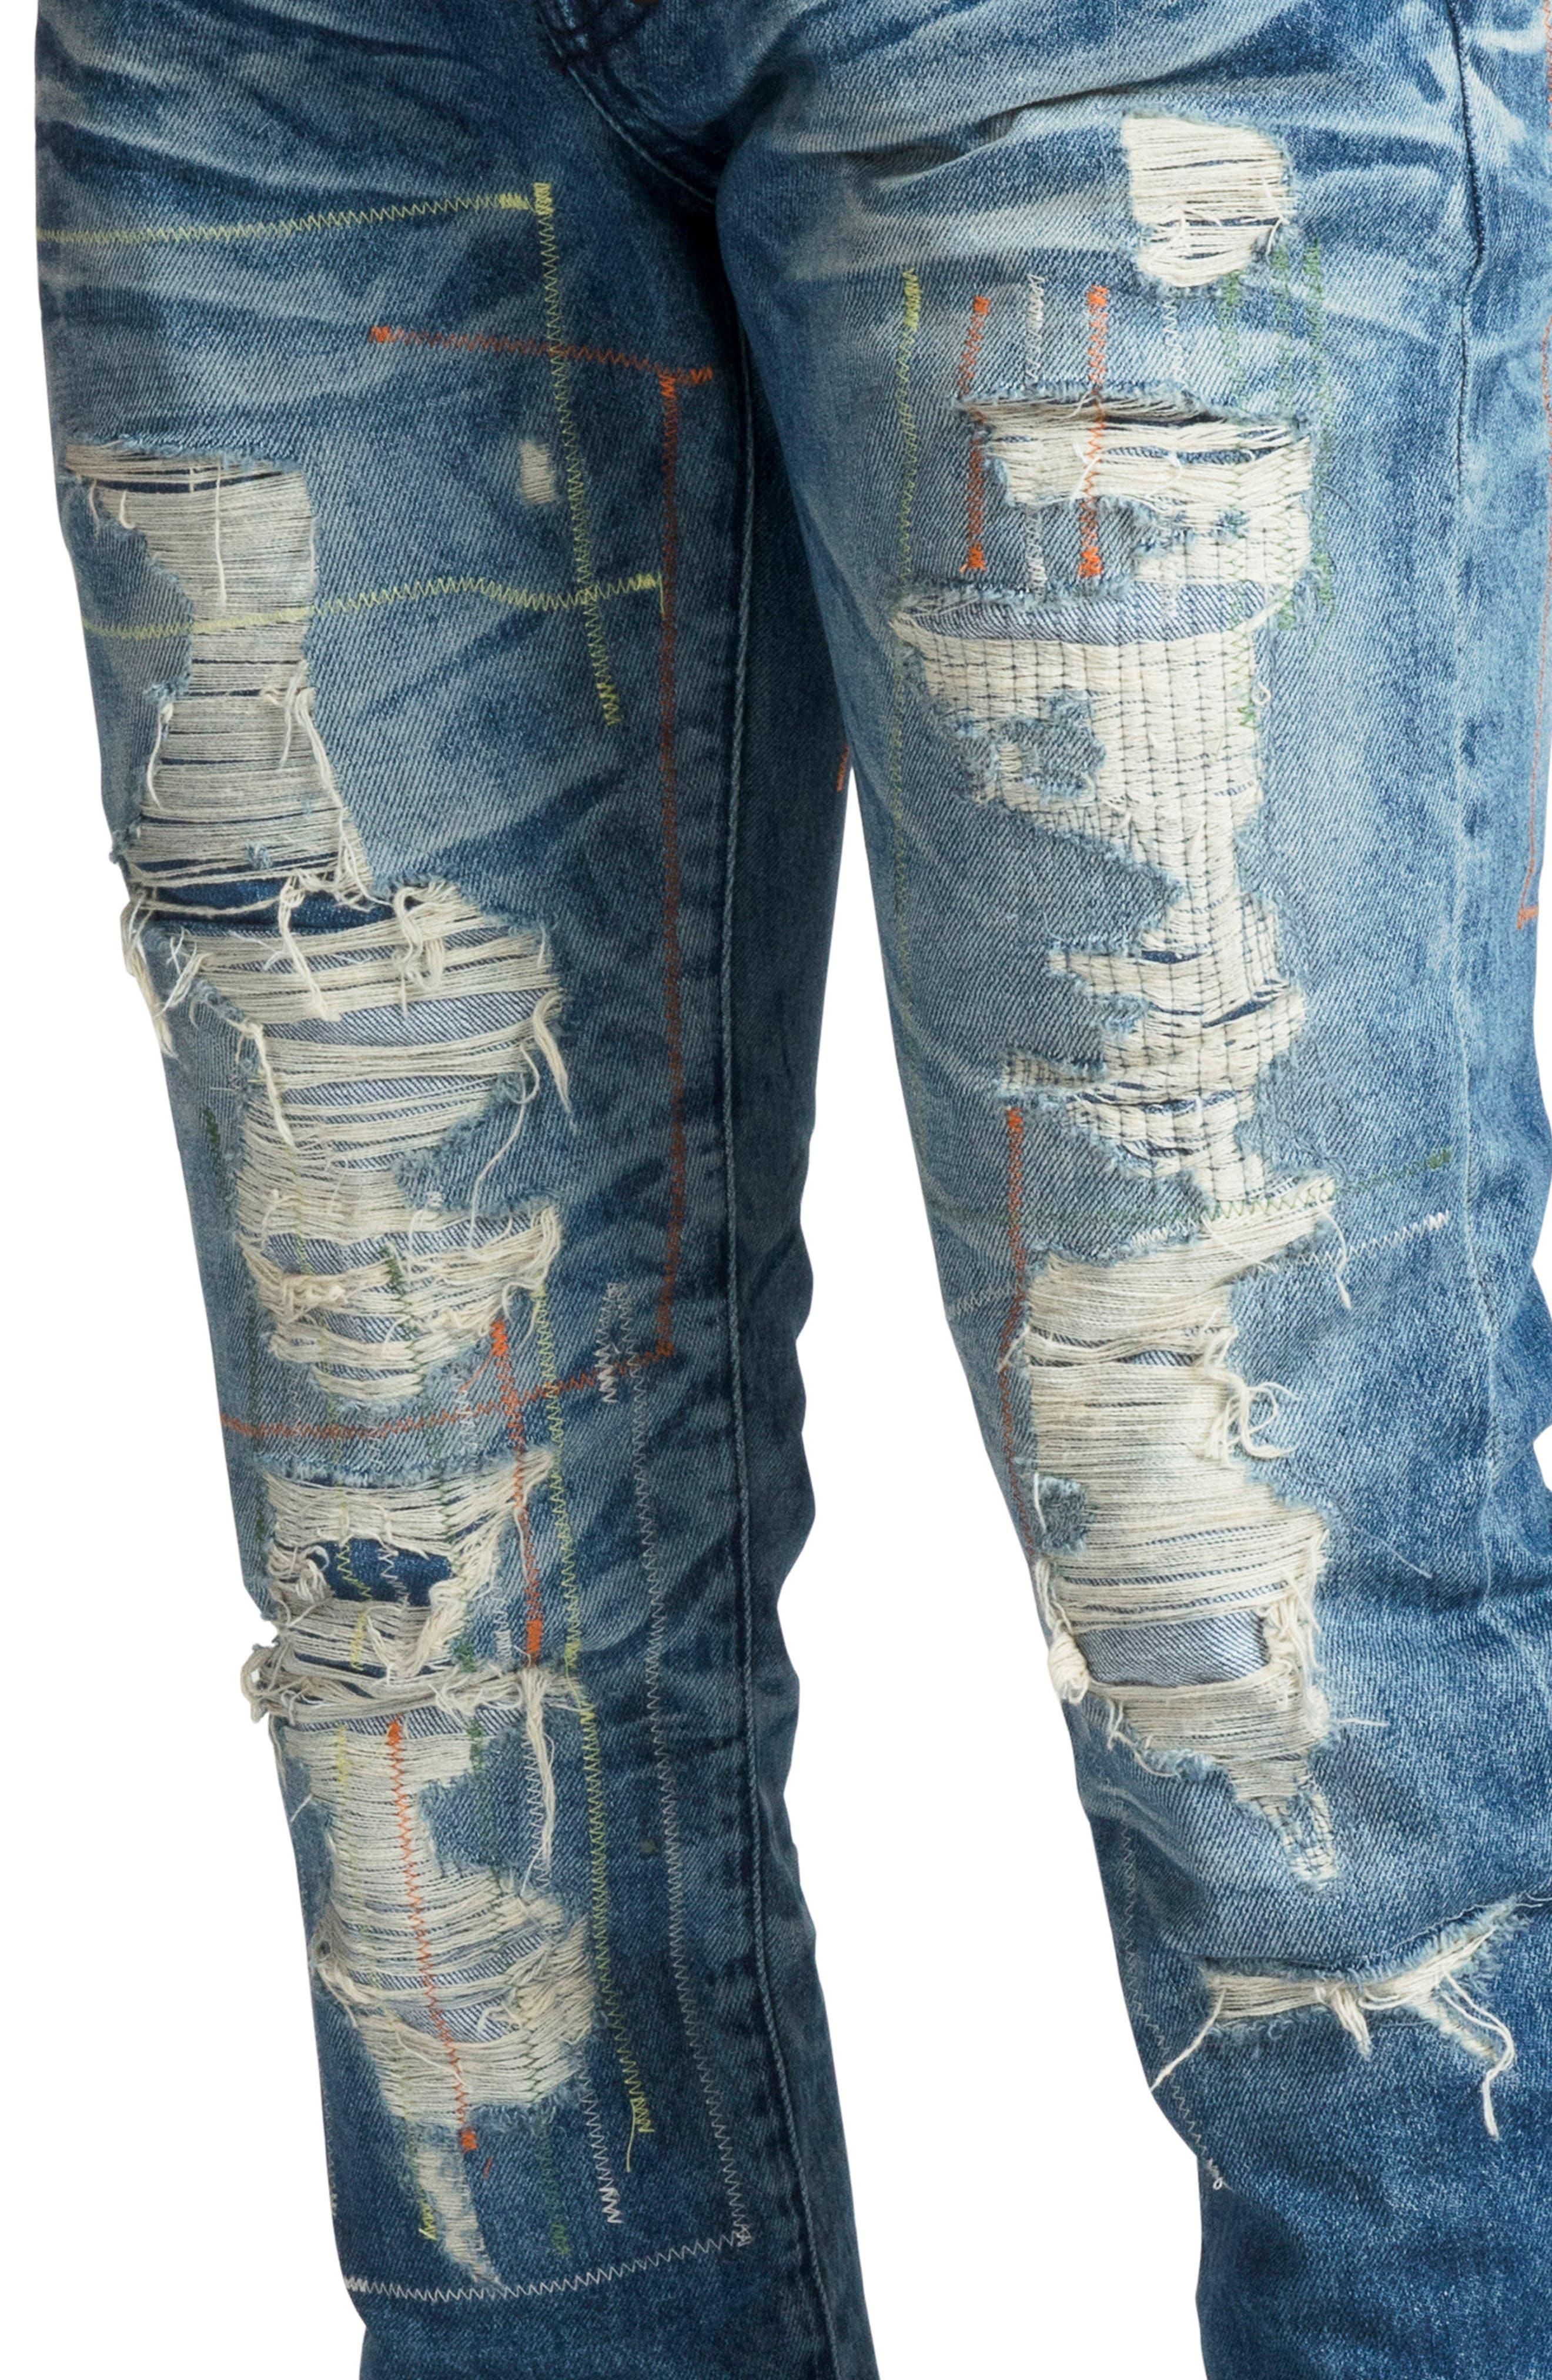 Le Sabre Slim Fit Jeans,                             Alternate thumbnail 4, color,                             COOING